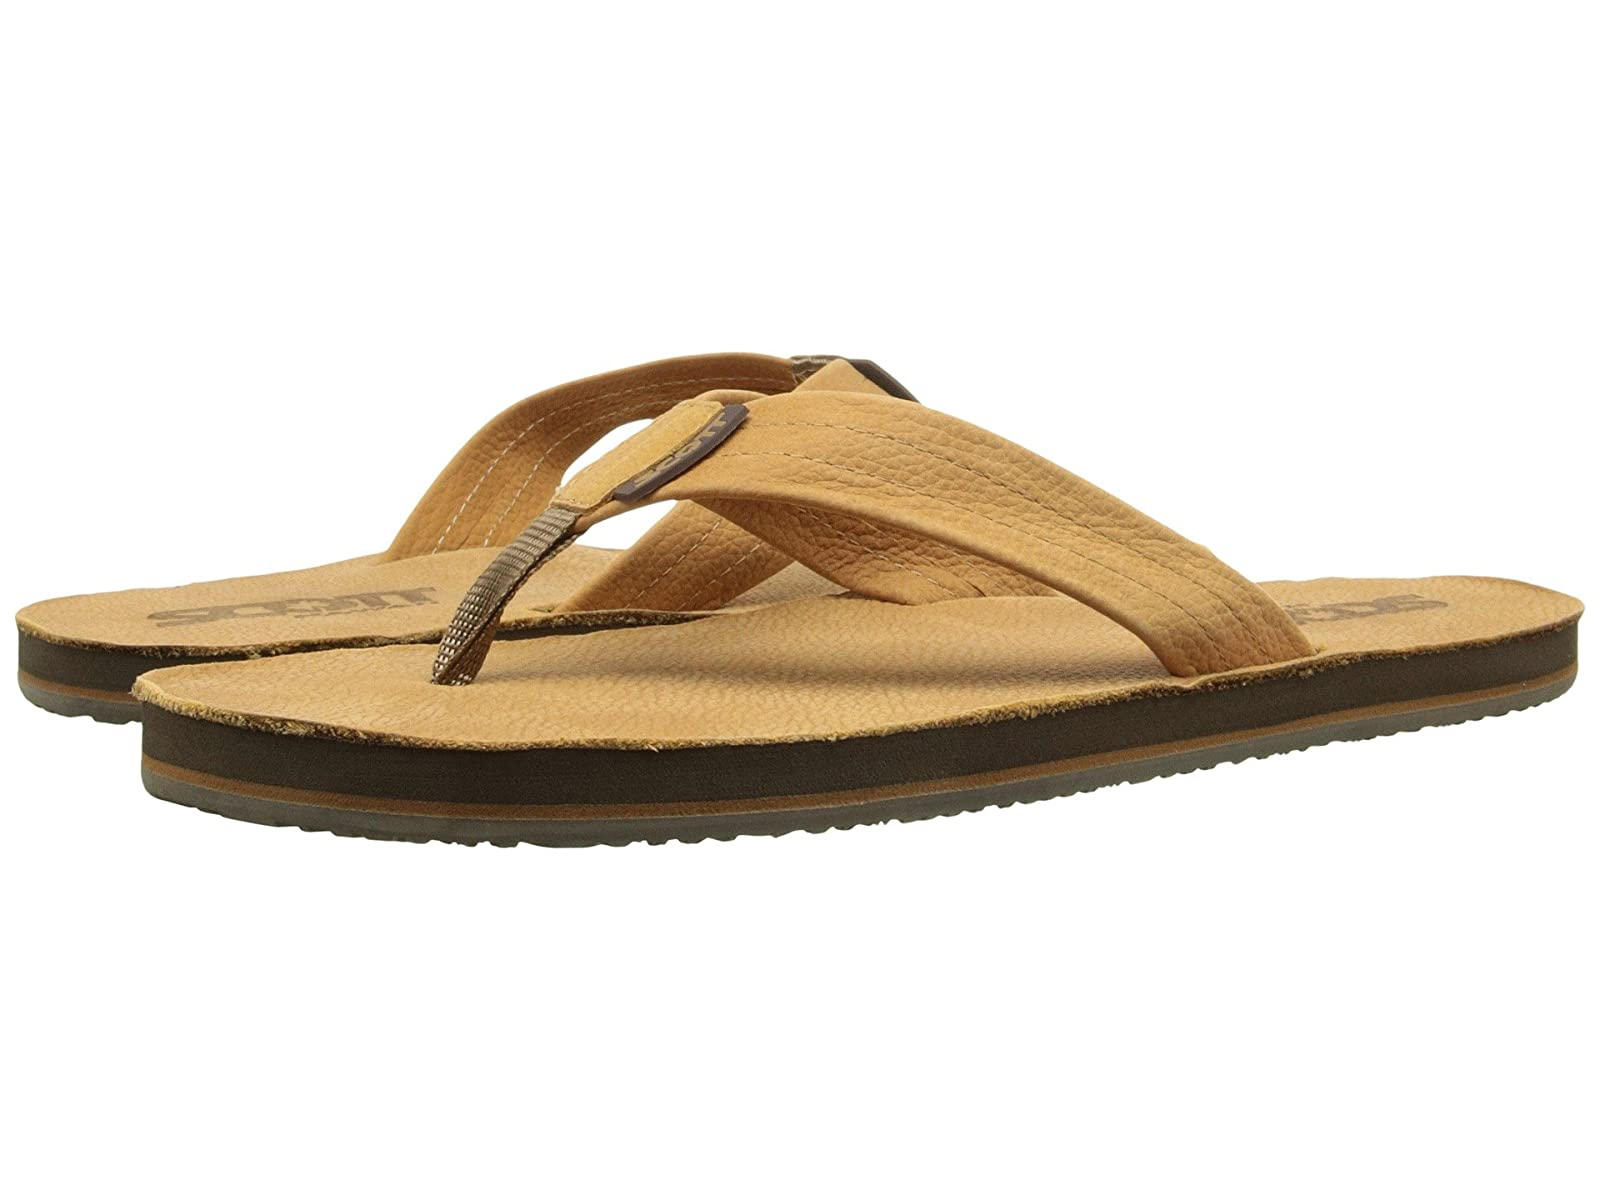 Scott Hawaii KakinaAtmospheric grades have affordable shoes